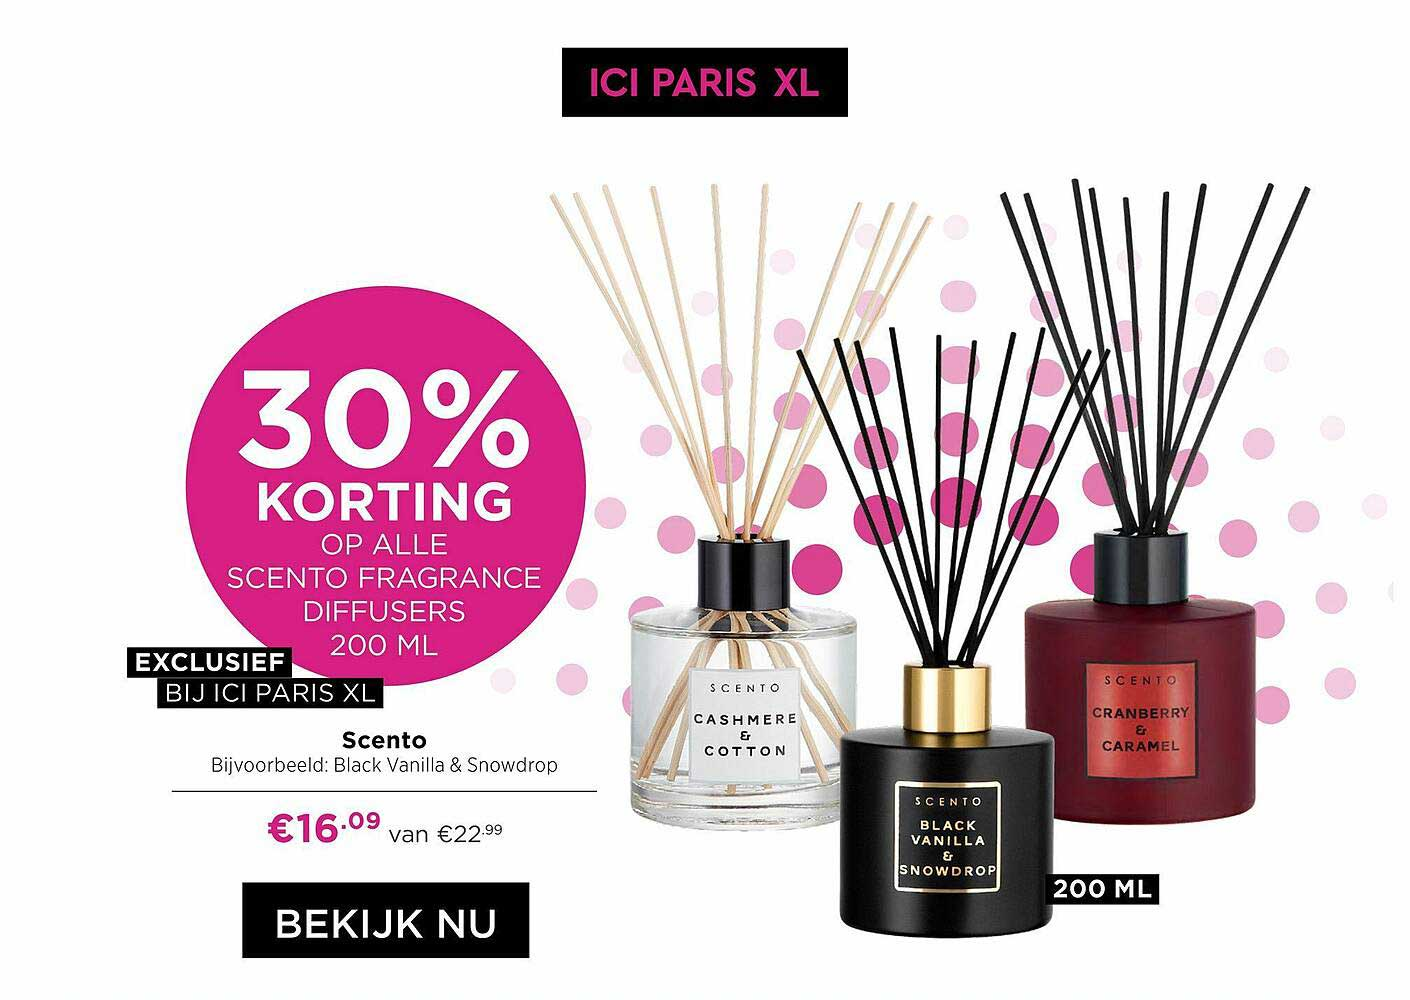 ICI PARIS XL Scento Black Vanilla & Snowdrop 30% Korting